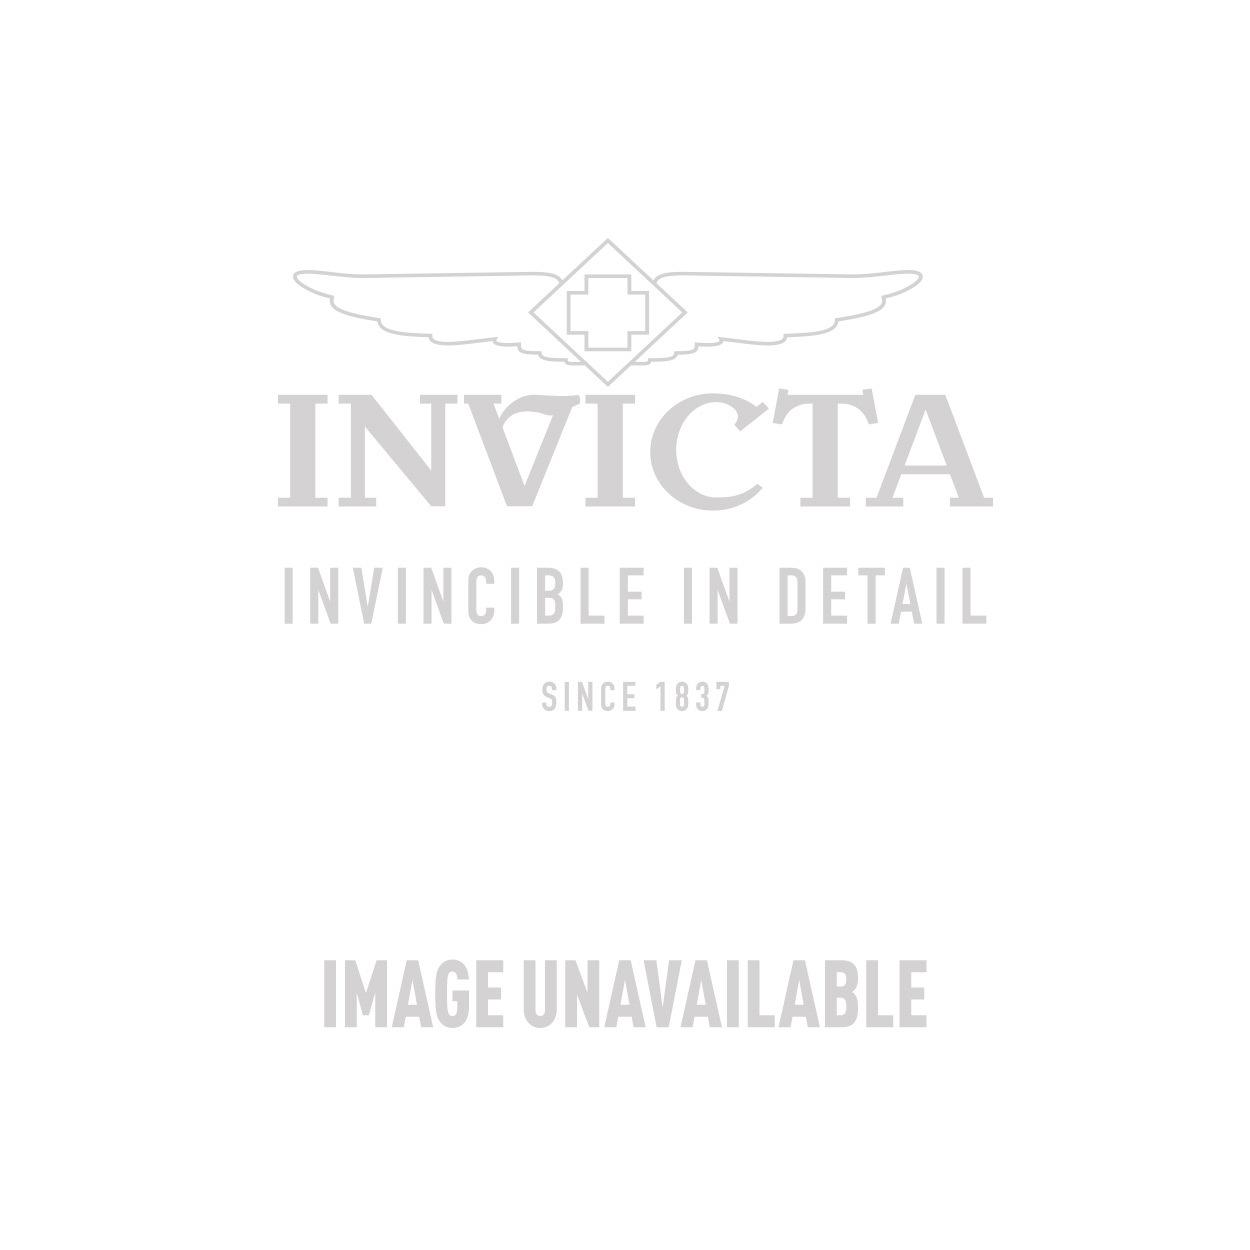 Men Watches - Invicta Venom Quartz Watch - Model 0967 - Invicta Stores